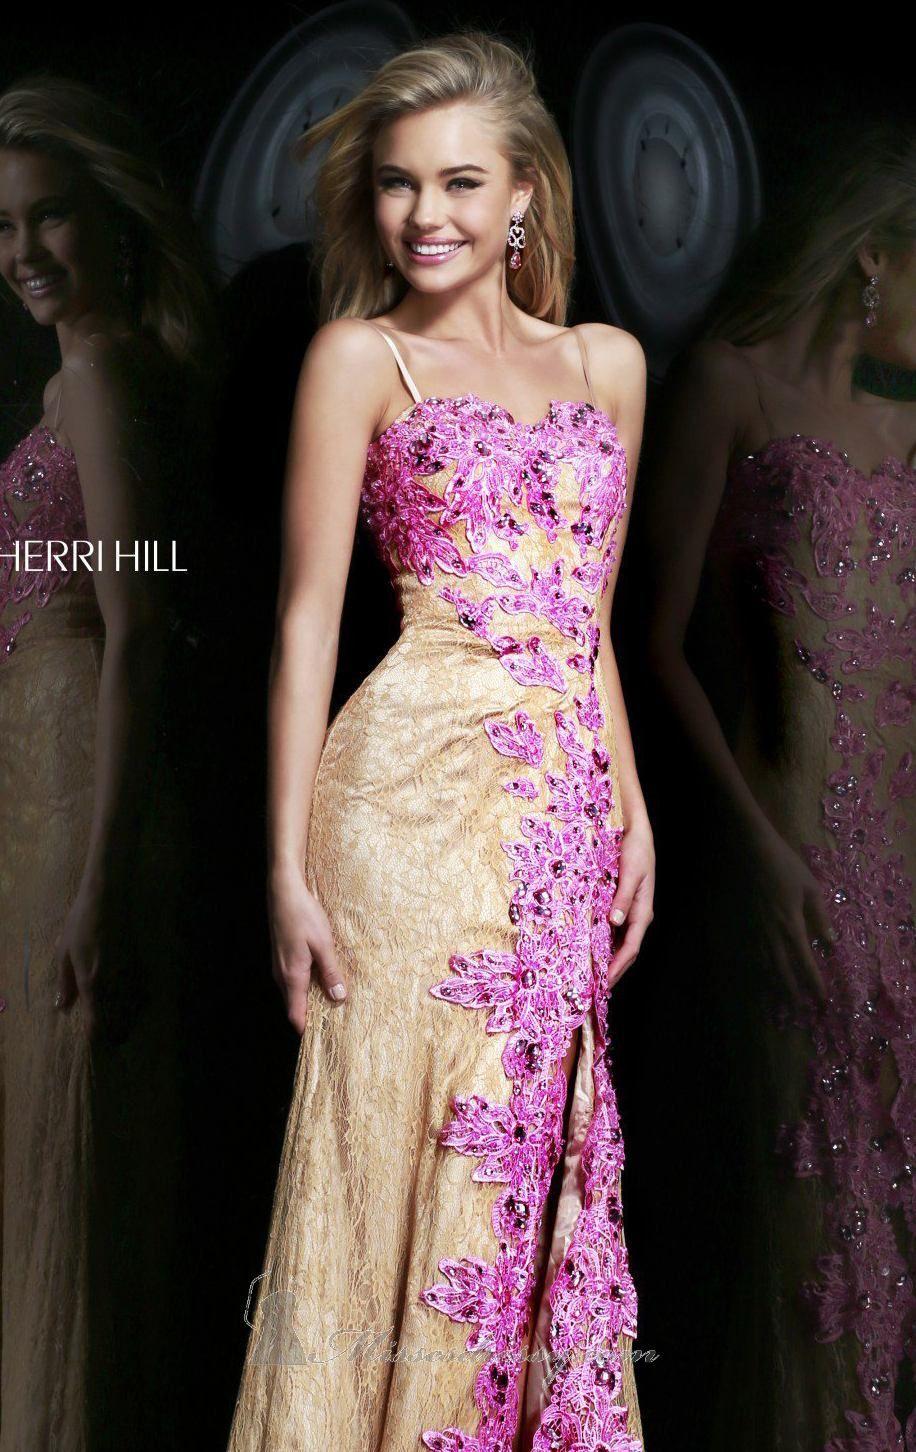 Sherri Hill 9817 Dress - MissesDressy.com | my favorite dresses ...